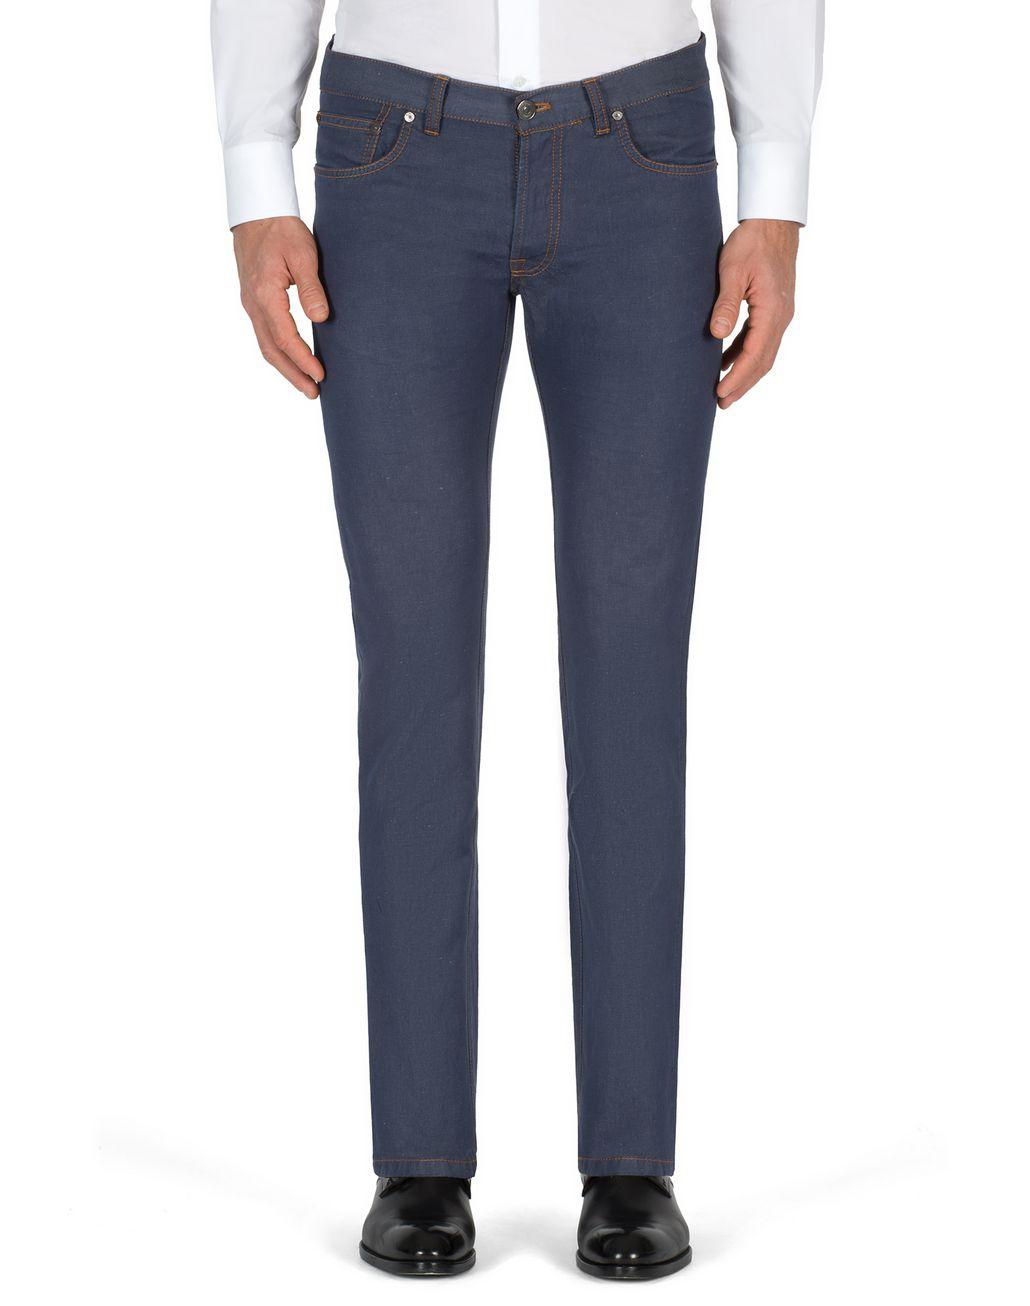 BRIONI Jean slim Aneto bleuet en lin et coton  Jean [*** pickupInStoreShippingNotGuaranteed_info ***] r